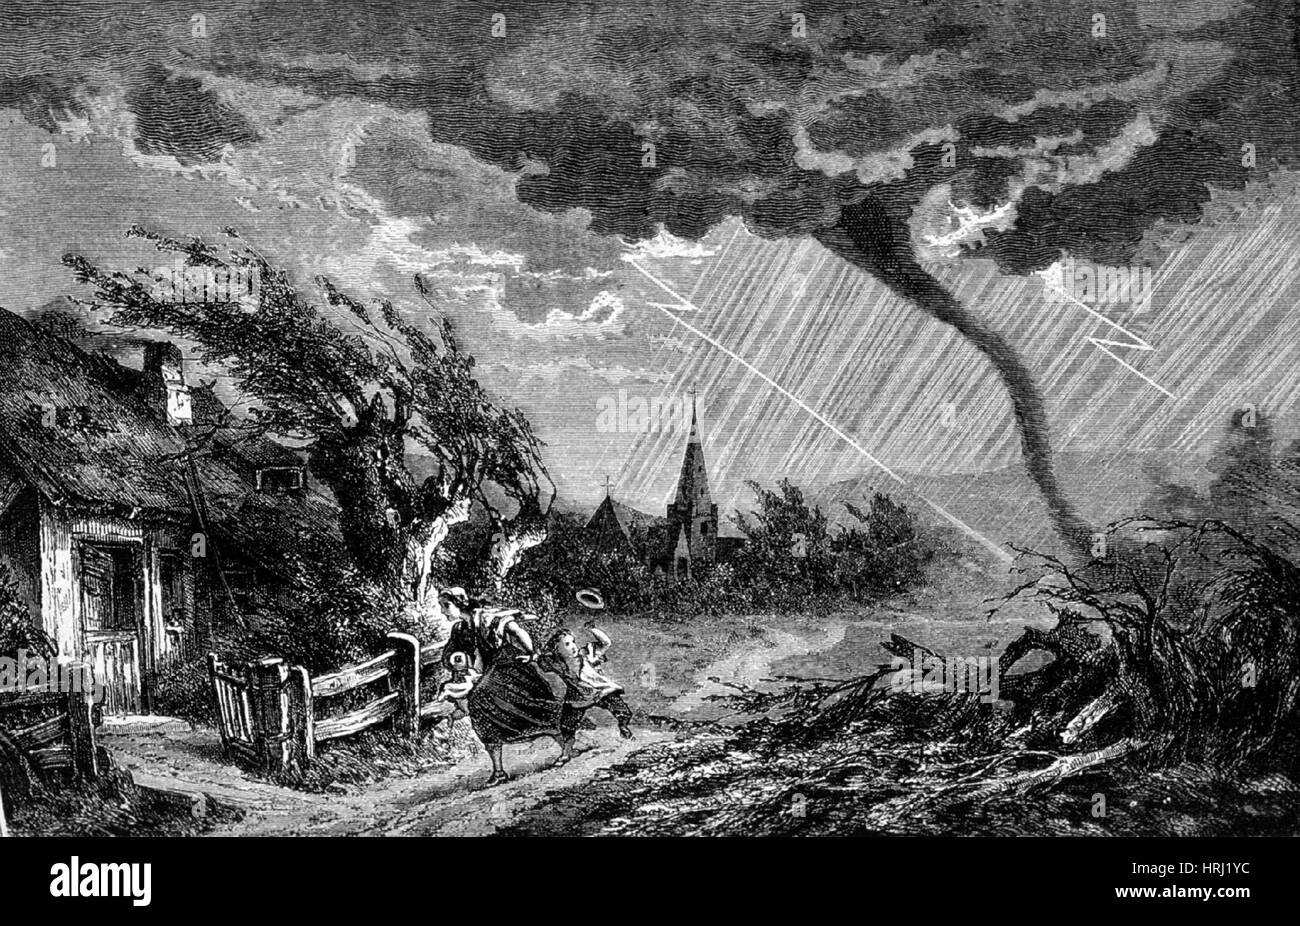 Tornado, Scattering Terror and Desolation, 1873 - Stock Image